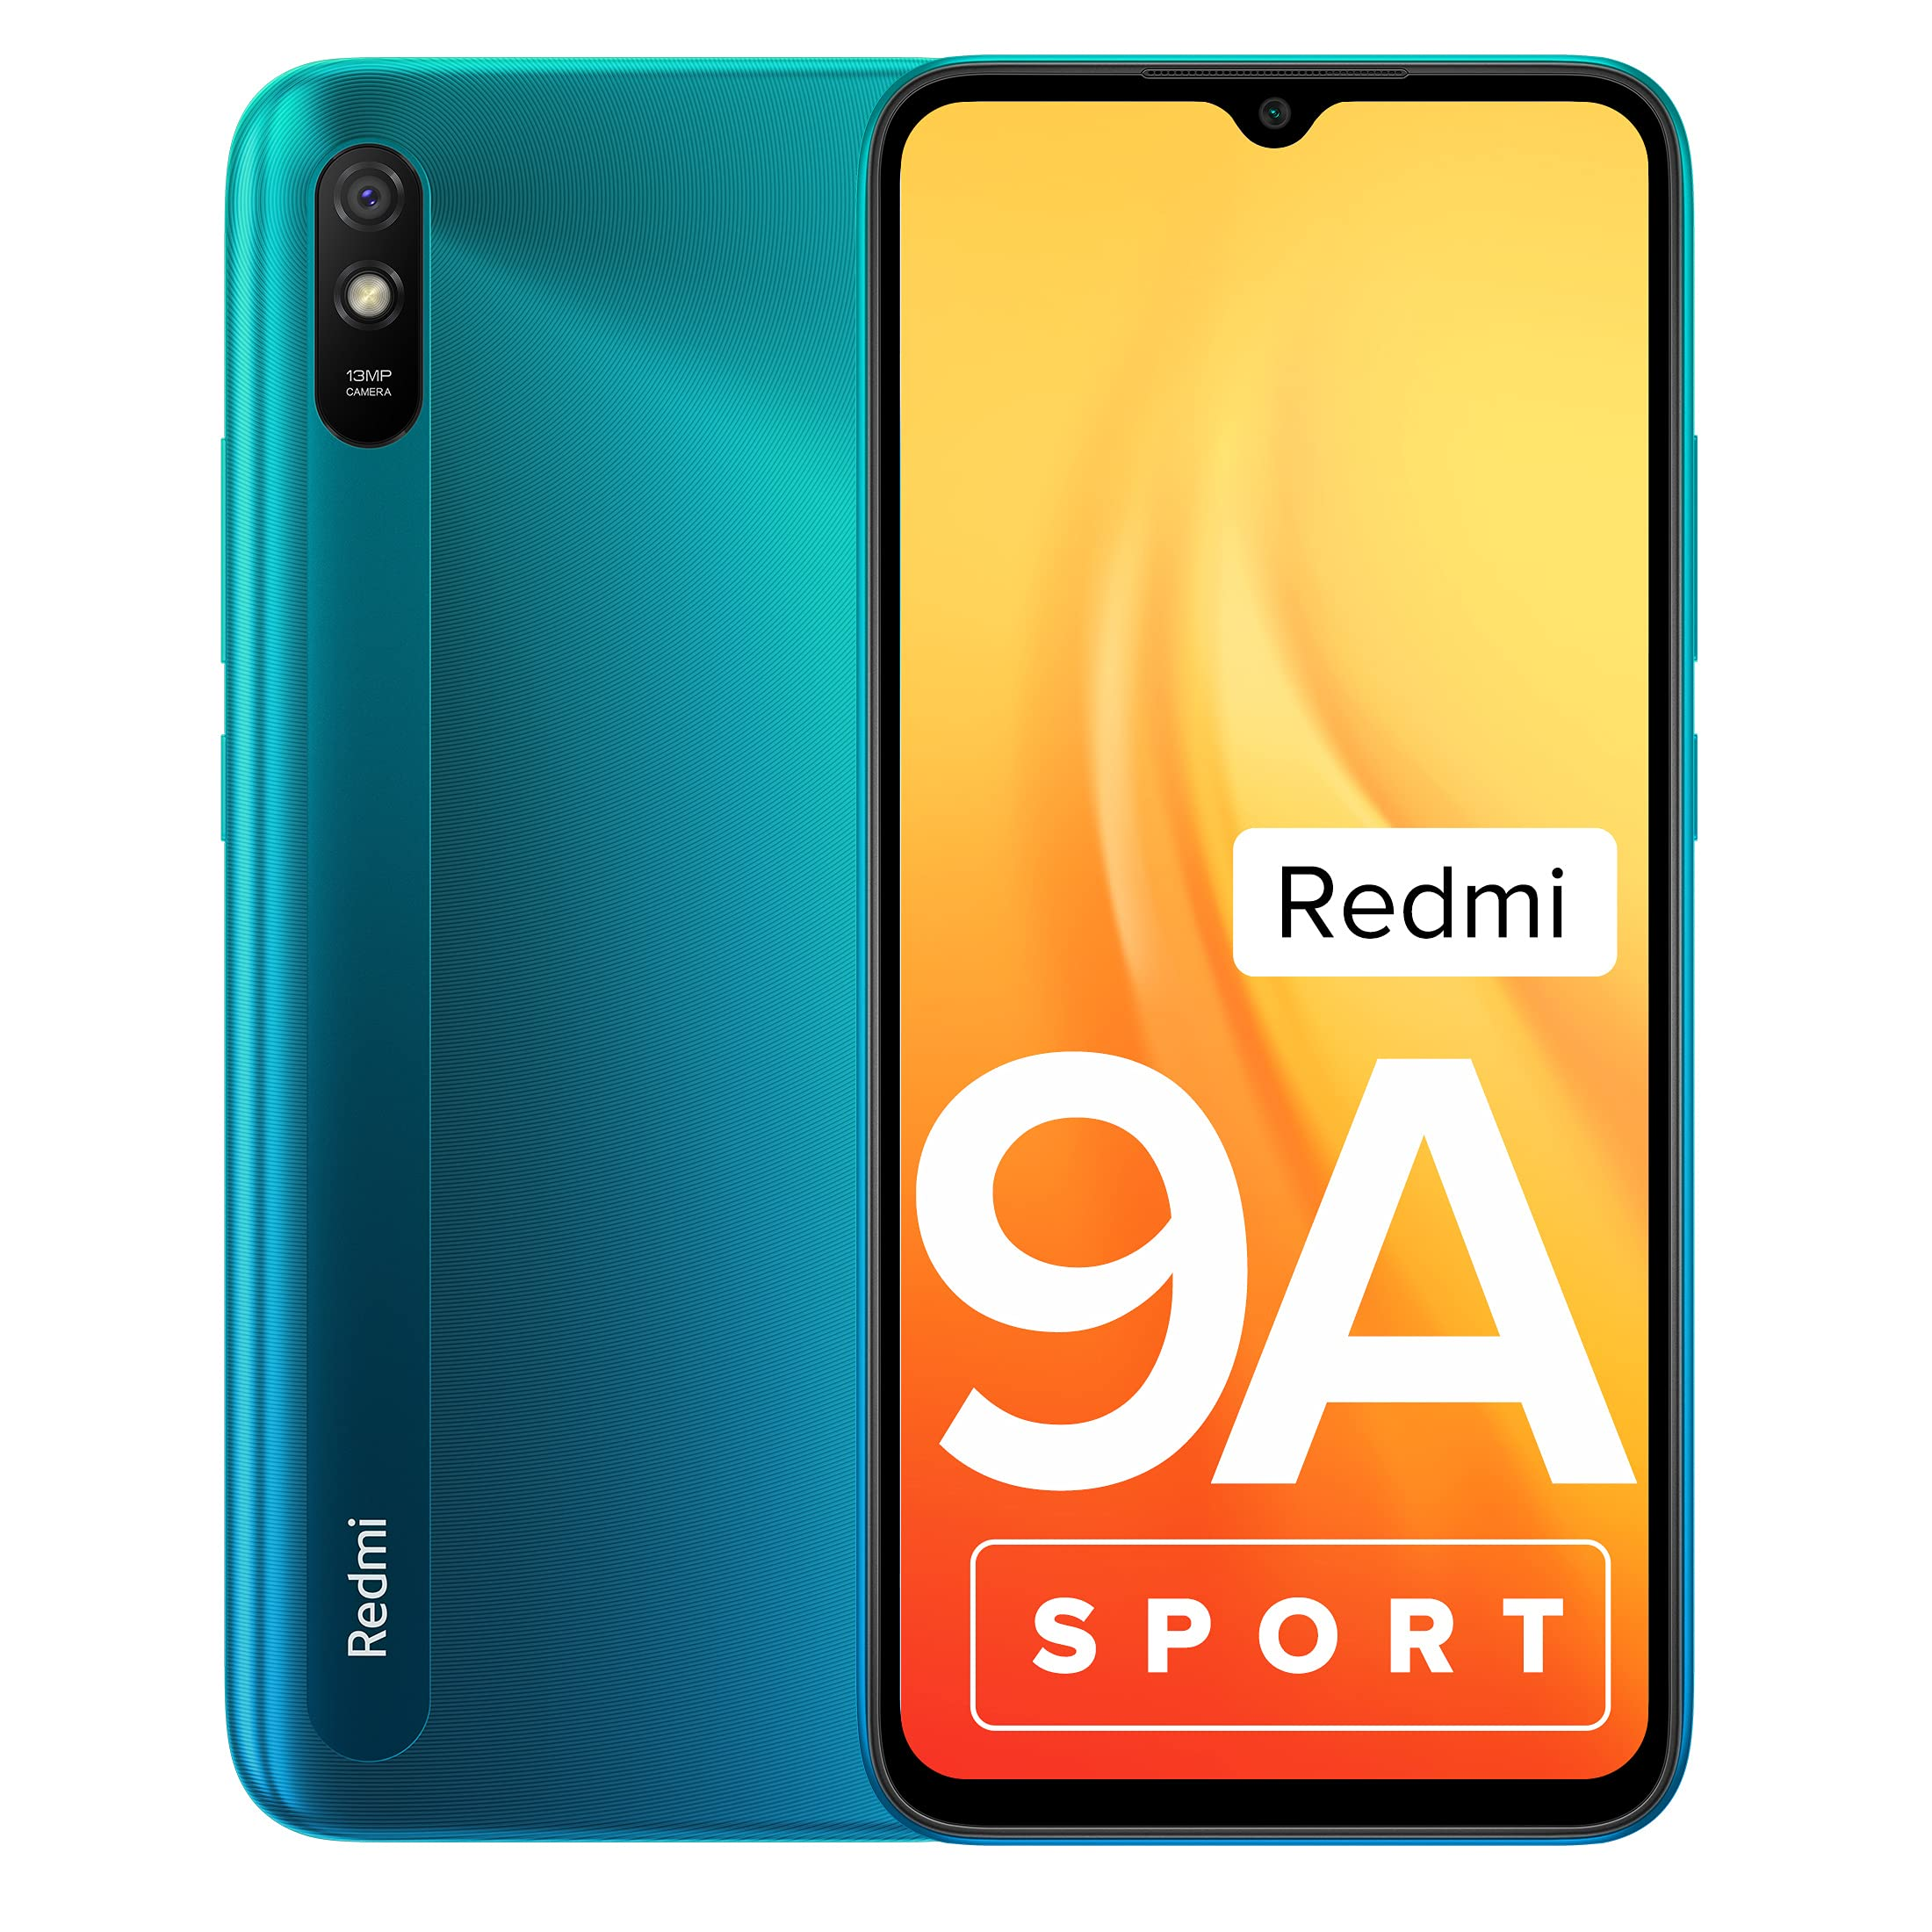 Redmi 9A Sport (Coral Green, 2GB RAM, 32GB Storage)